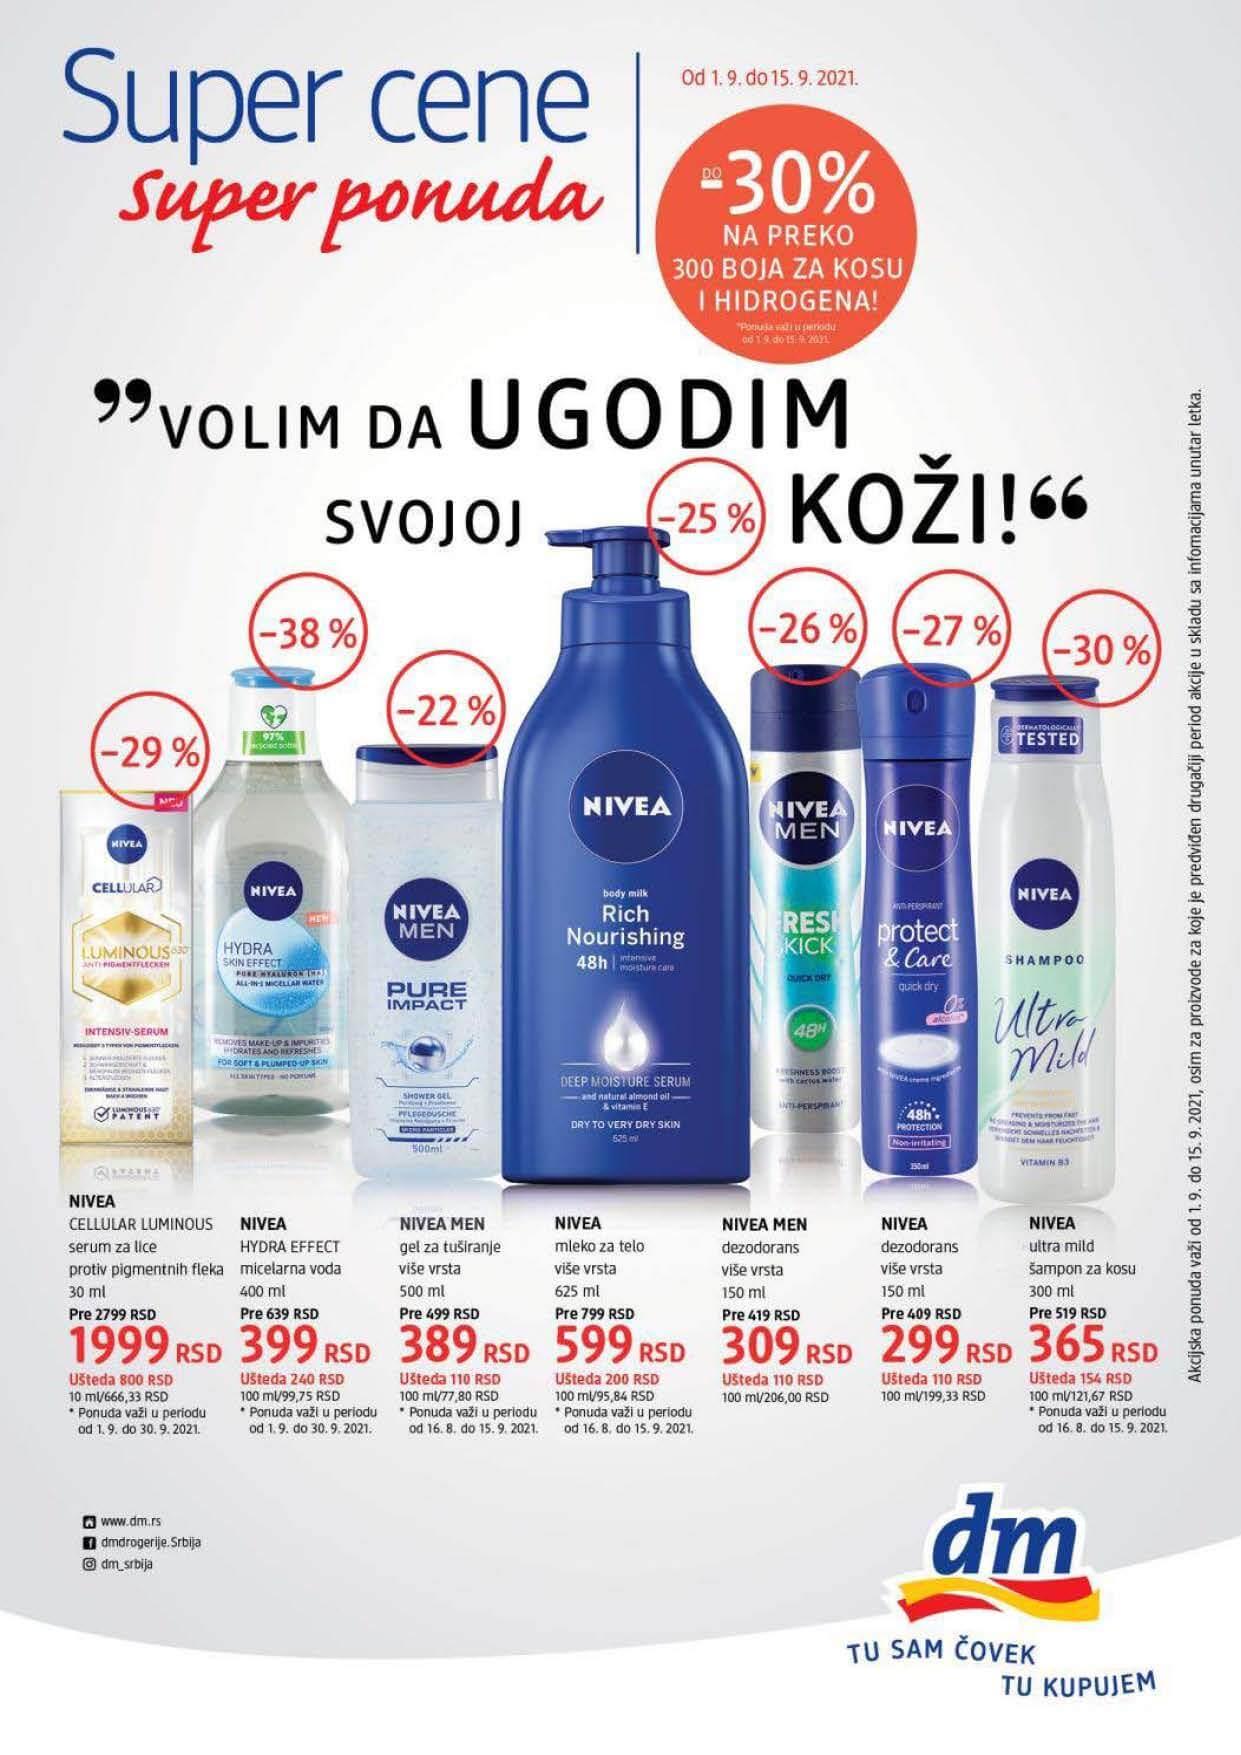 DM SUPER CENE Srbija Septembar 2021 1.9.2021. 15.9.2021. Page 1 1